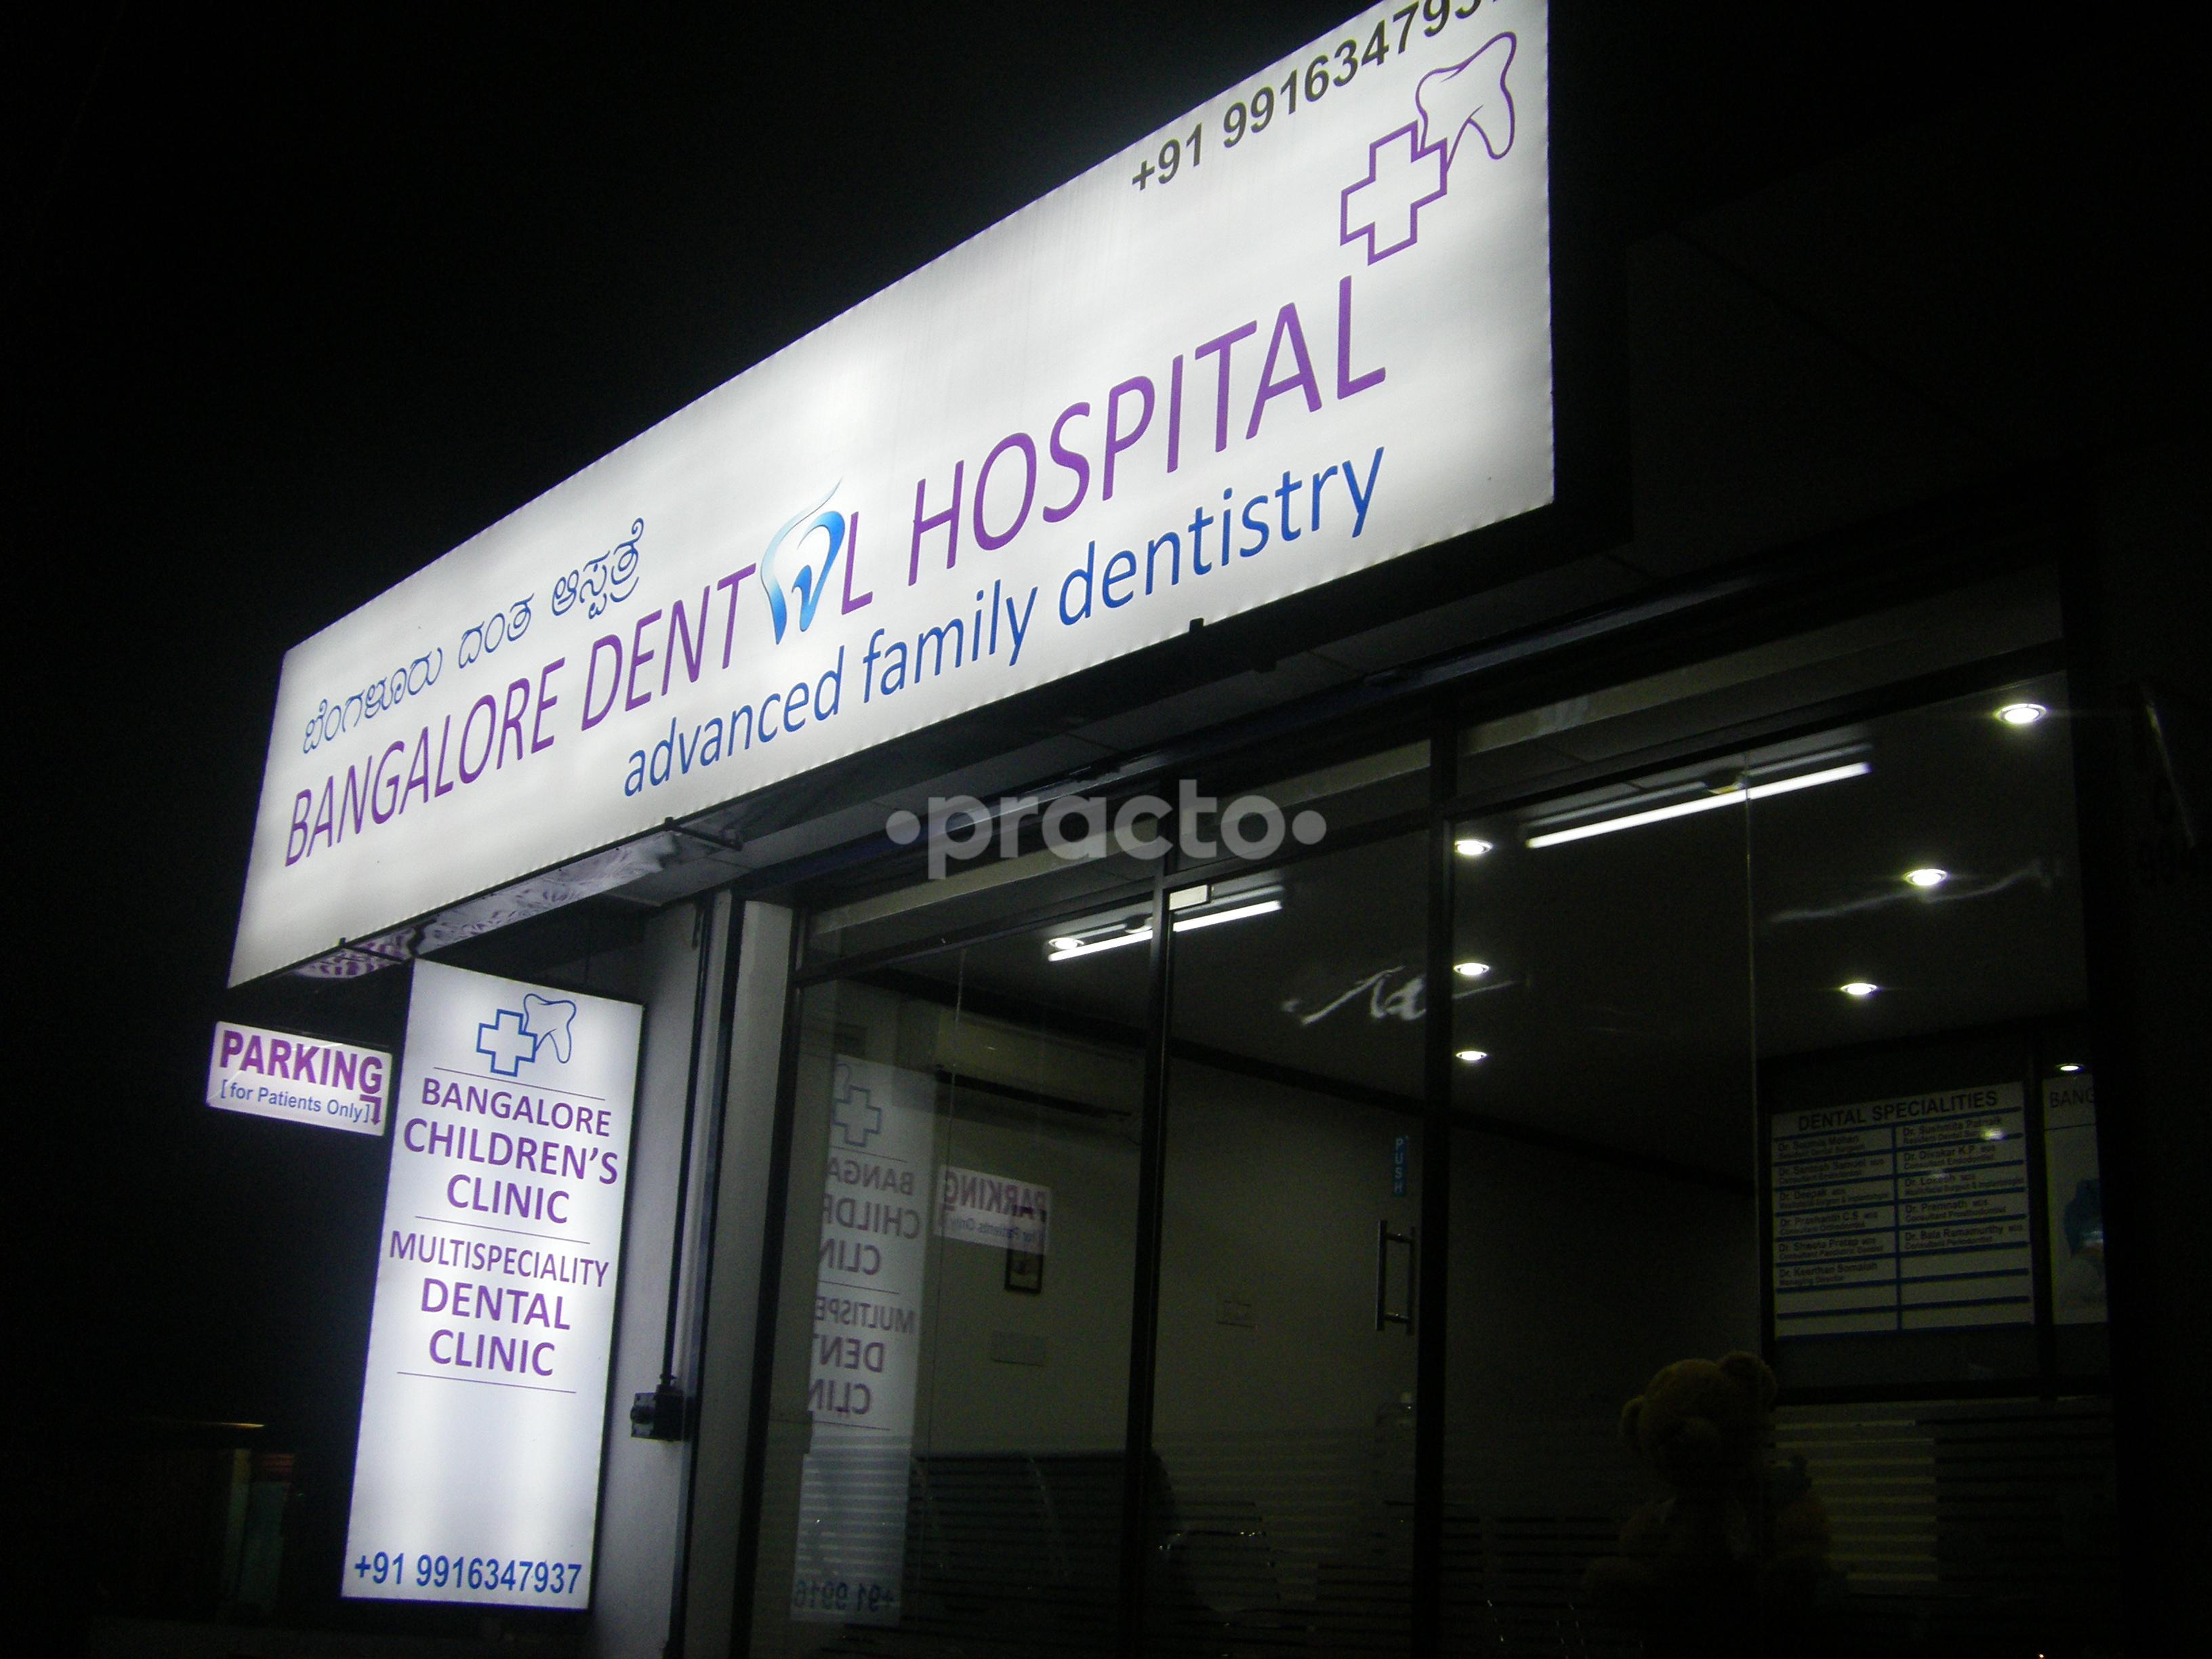 Bangalore Dental Hospital and Children's Clinic